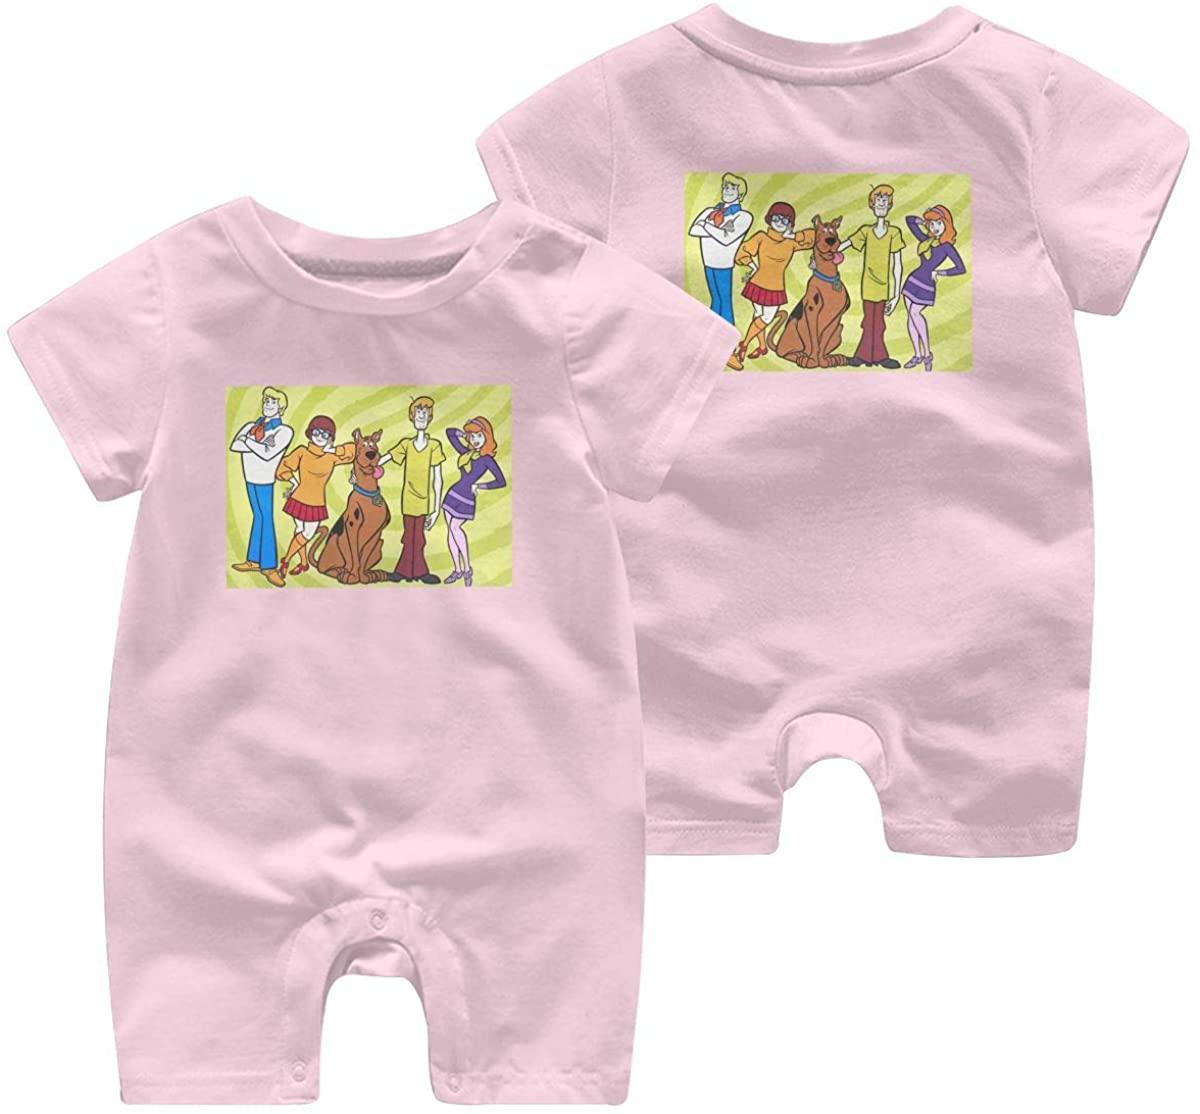 Scooby-Doo Leisure Baby Short Sleeve Jumpsuit Kid Breathable Baby Pajama Sleeper Cotton Romper